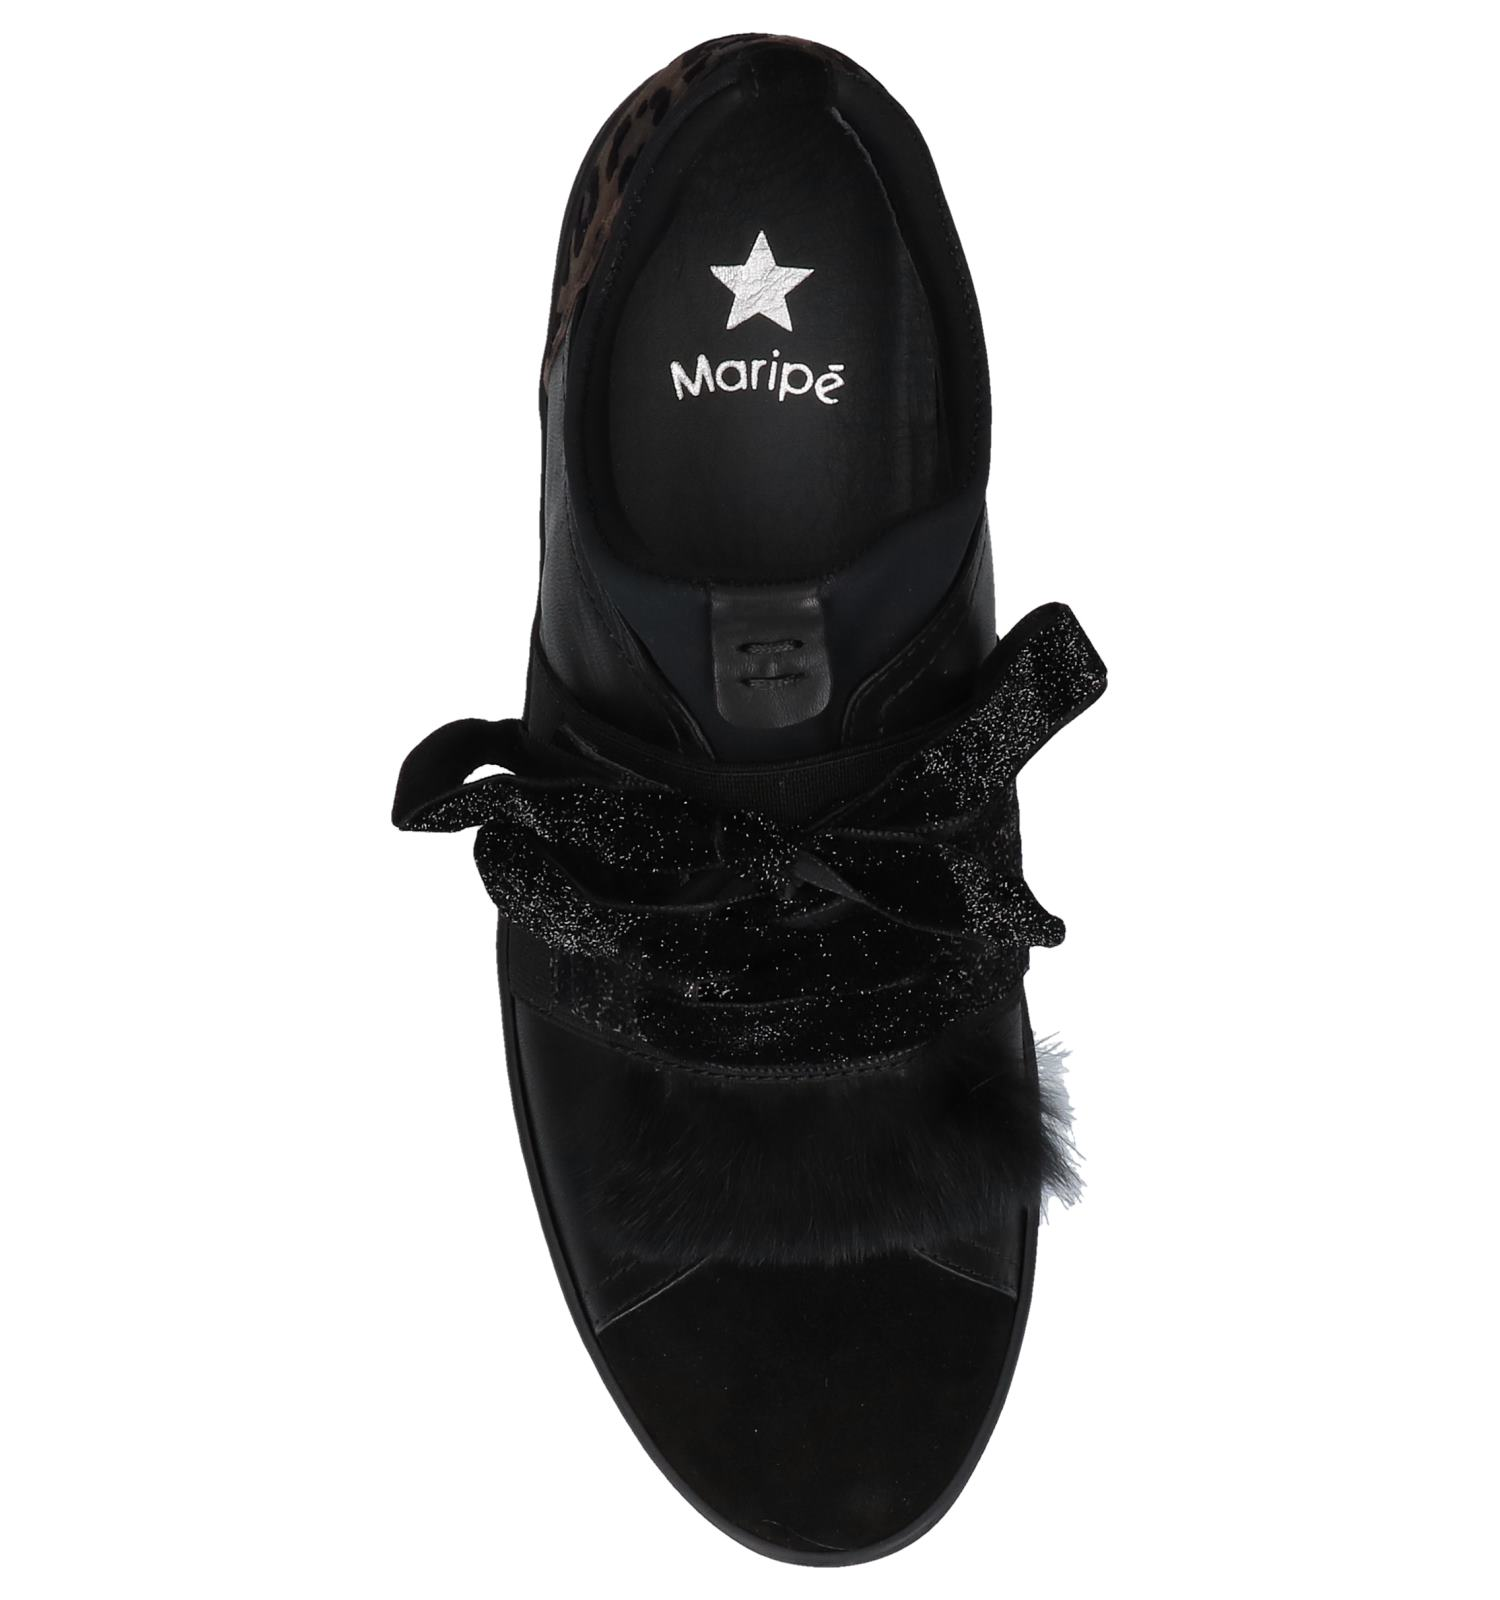 Lage Zwarte Maripé Sneakers Maripé Sneakers Zwarte Sneakers Zwarte Lage Maripé Lage K1JFTlc